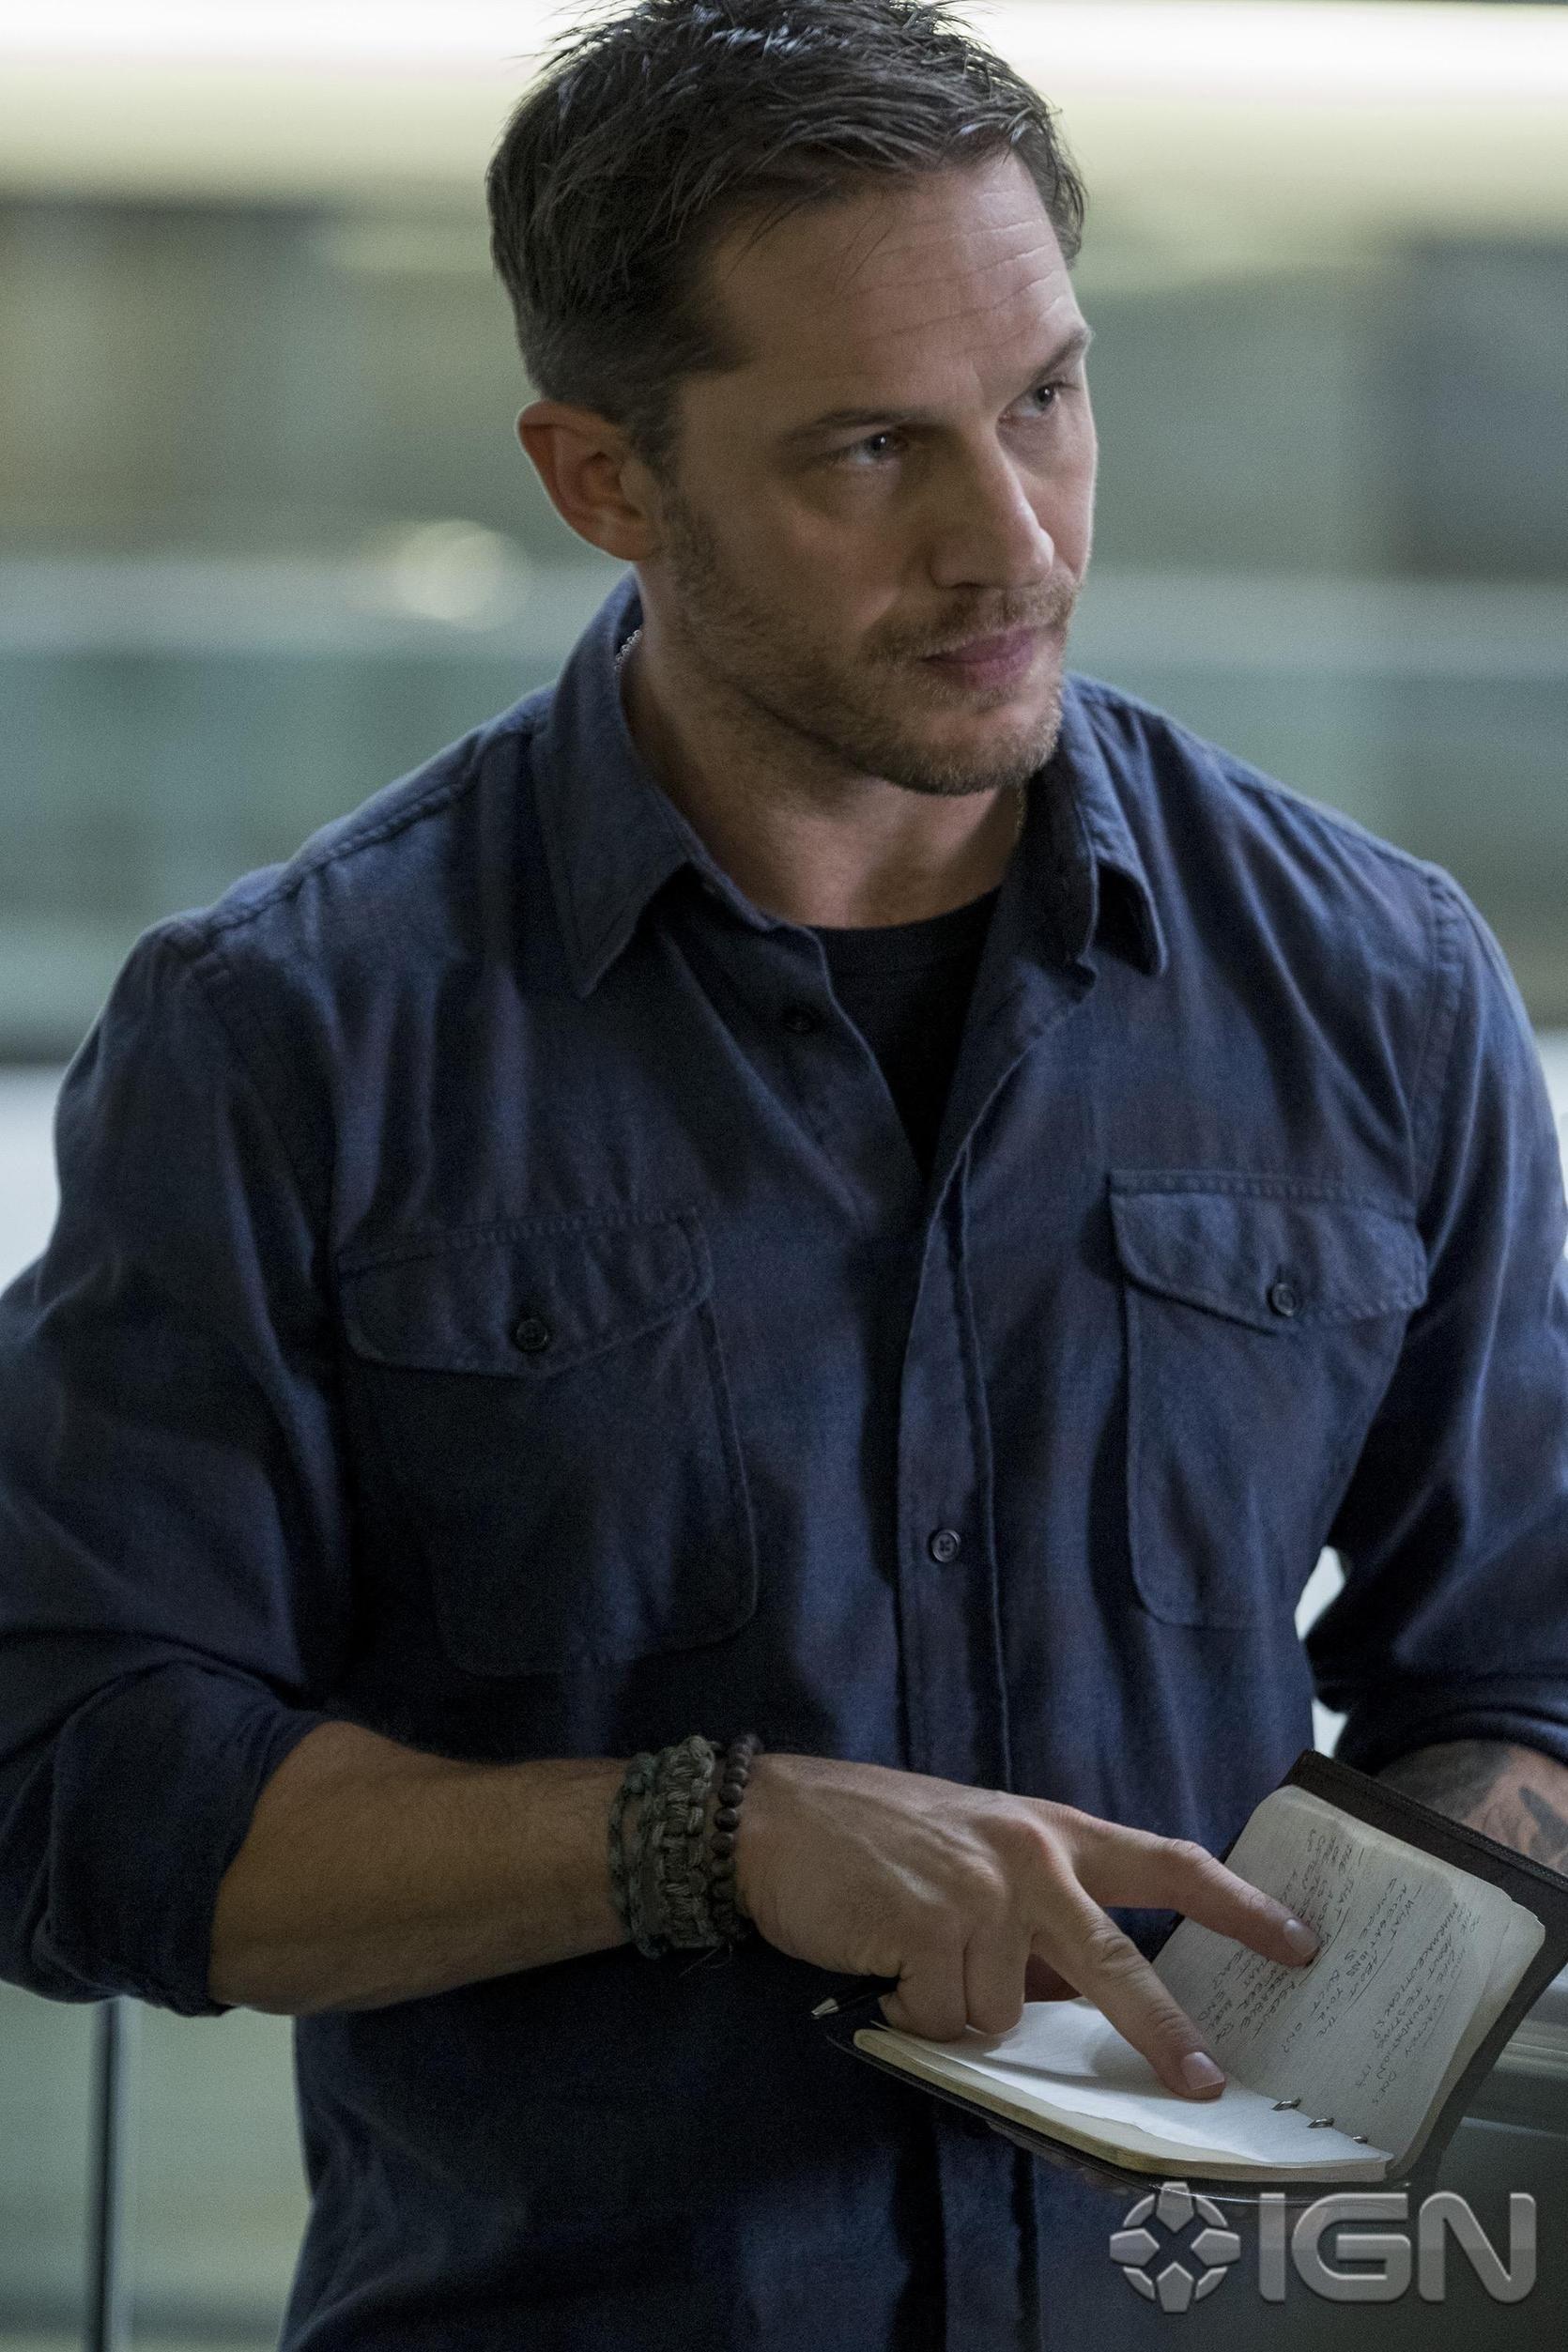 Tom Hardy stars as Eddie Brock in the upcoming Venom film (Credit: Sony/IGN)